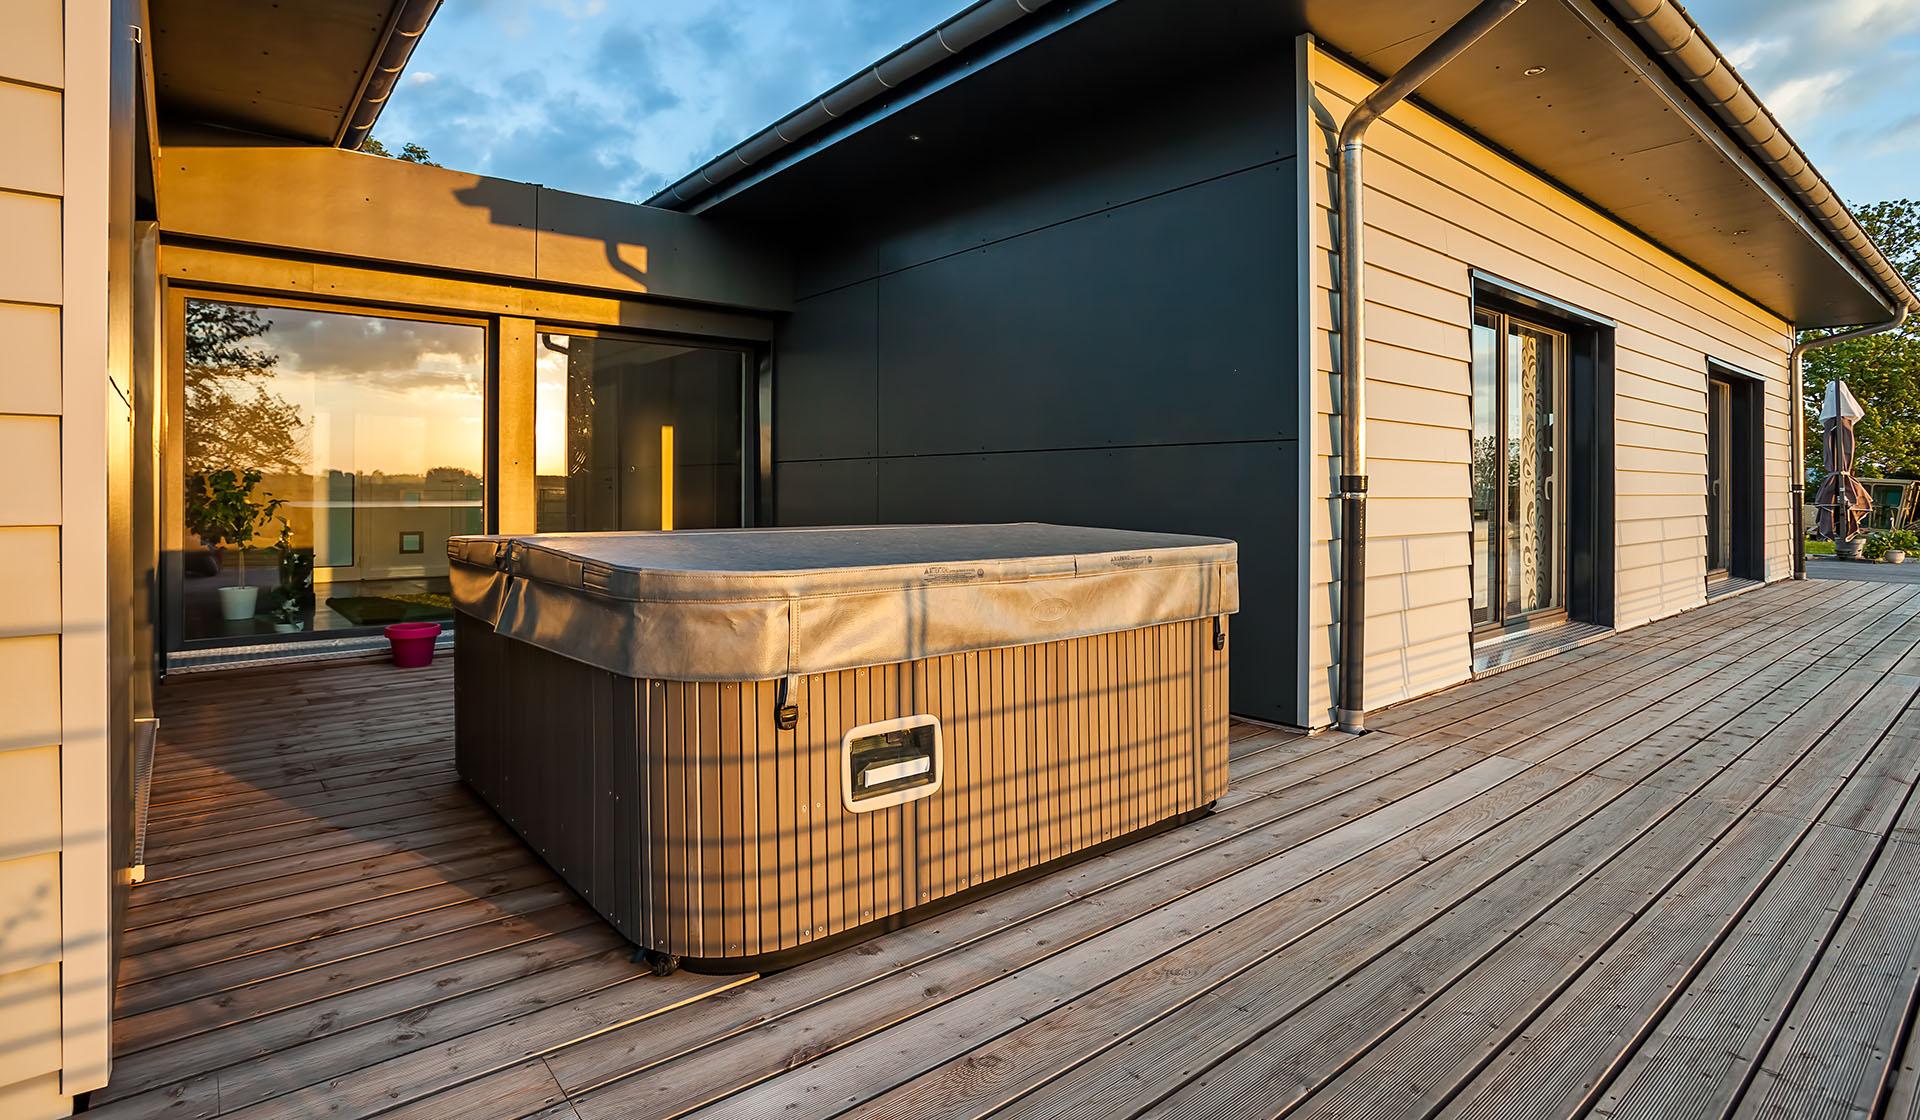 Maison bois 70m2 elegant idee modele de maison moderne for Maison moderne 70m2